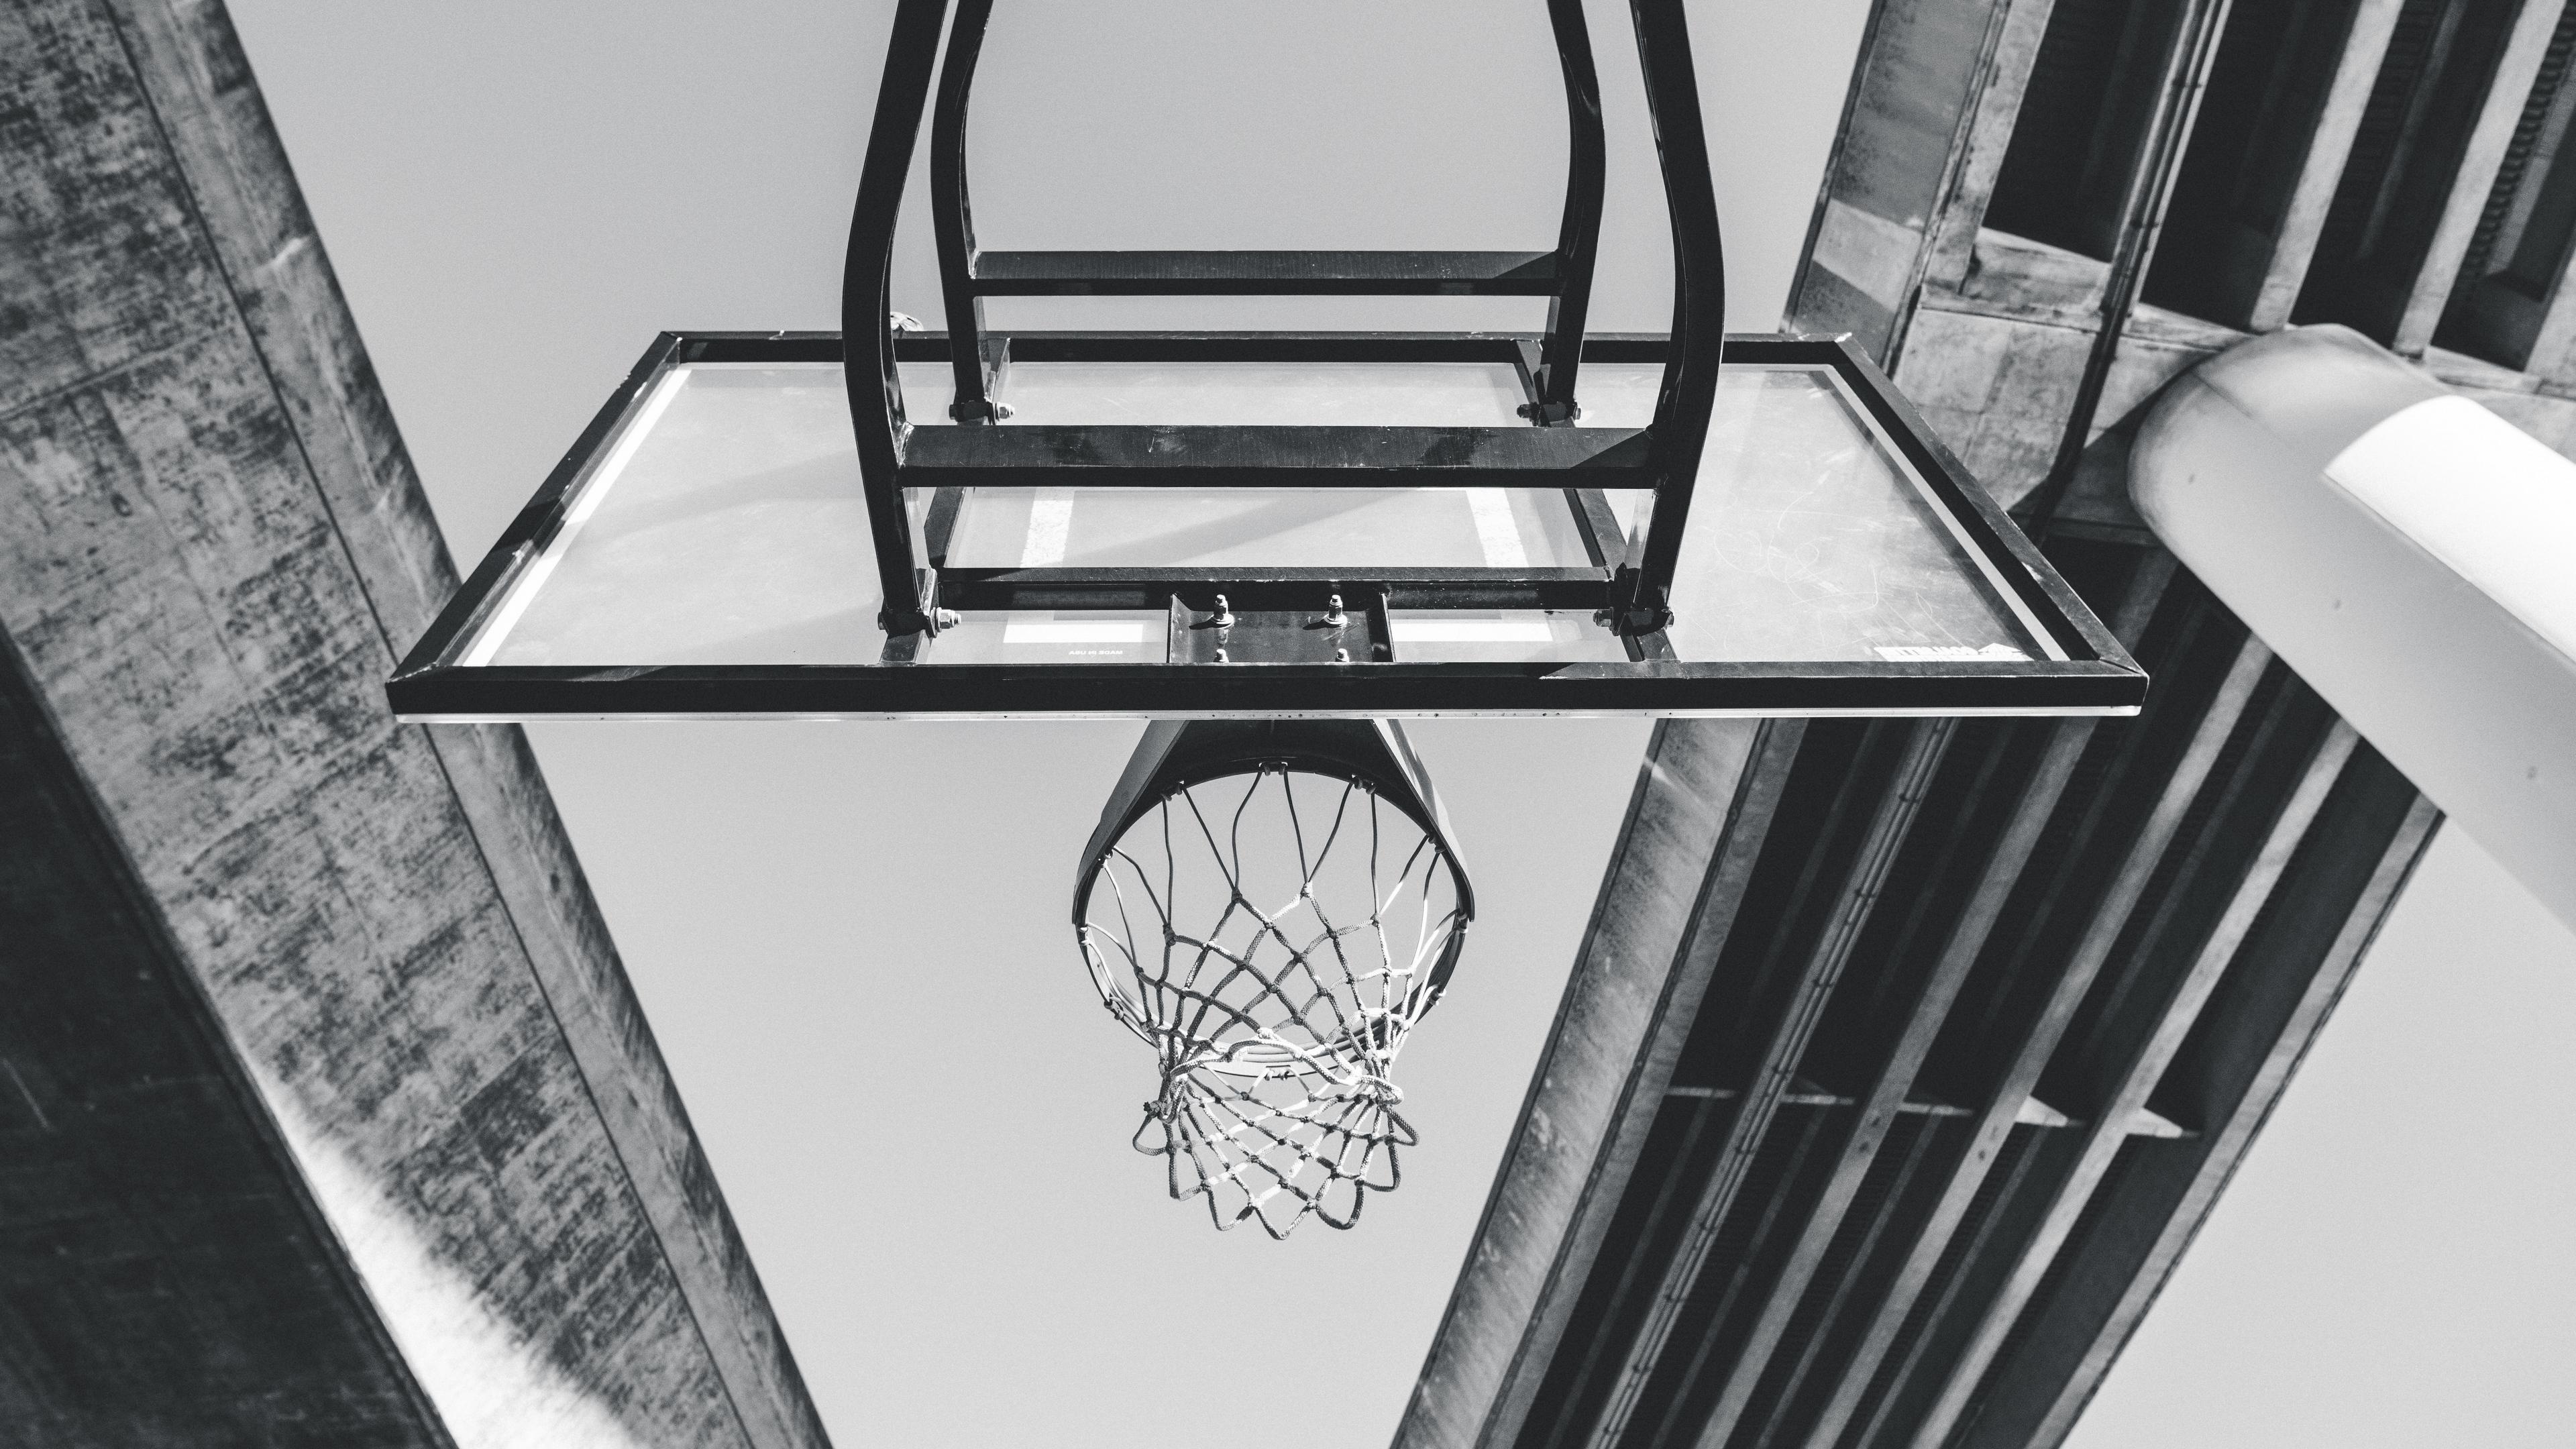 basketball ring mesh bw 4k 1540063200 - basketball, ring, mesh, bw 4k - Ring, mesh, Basketball